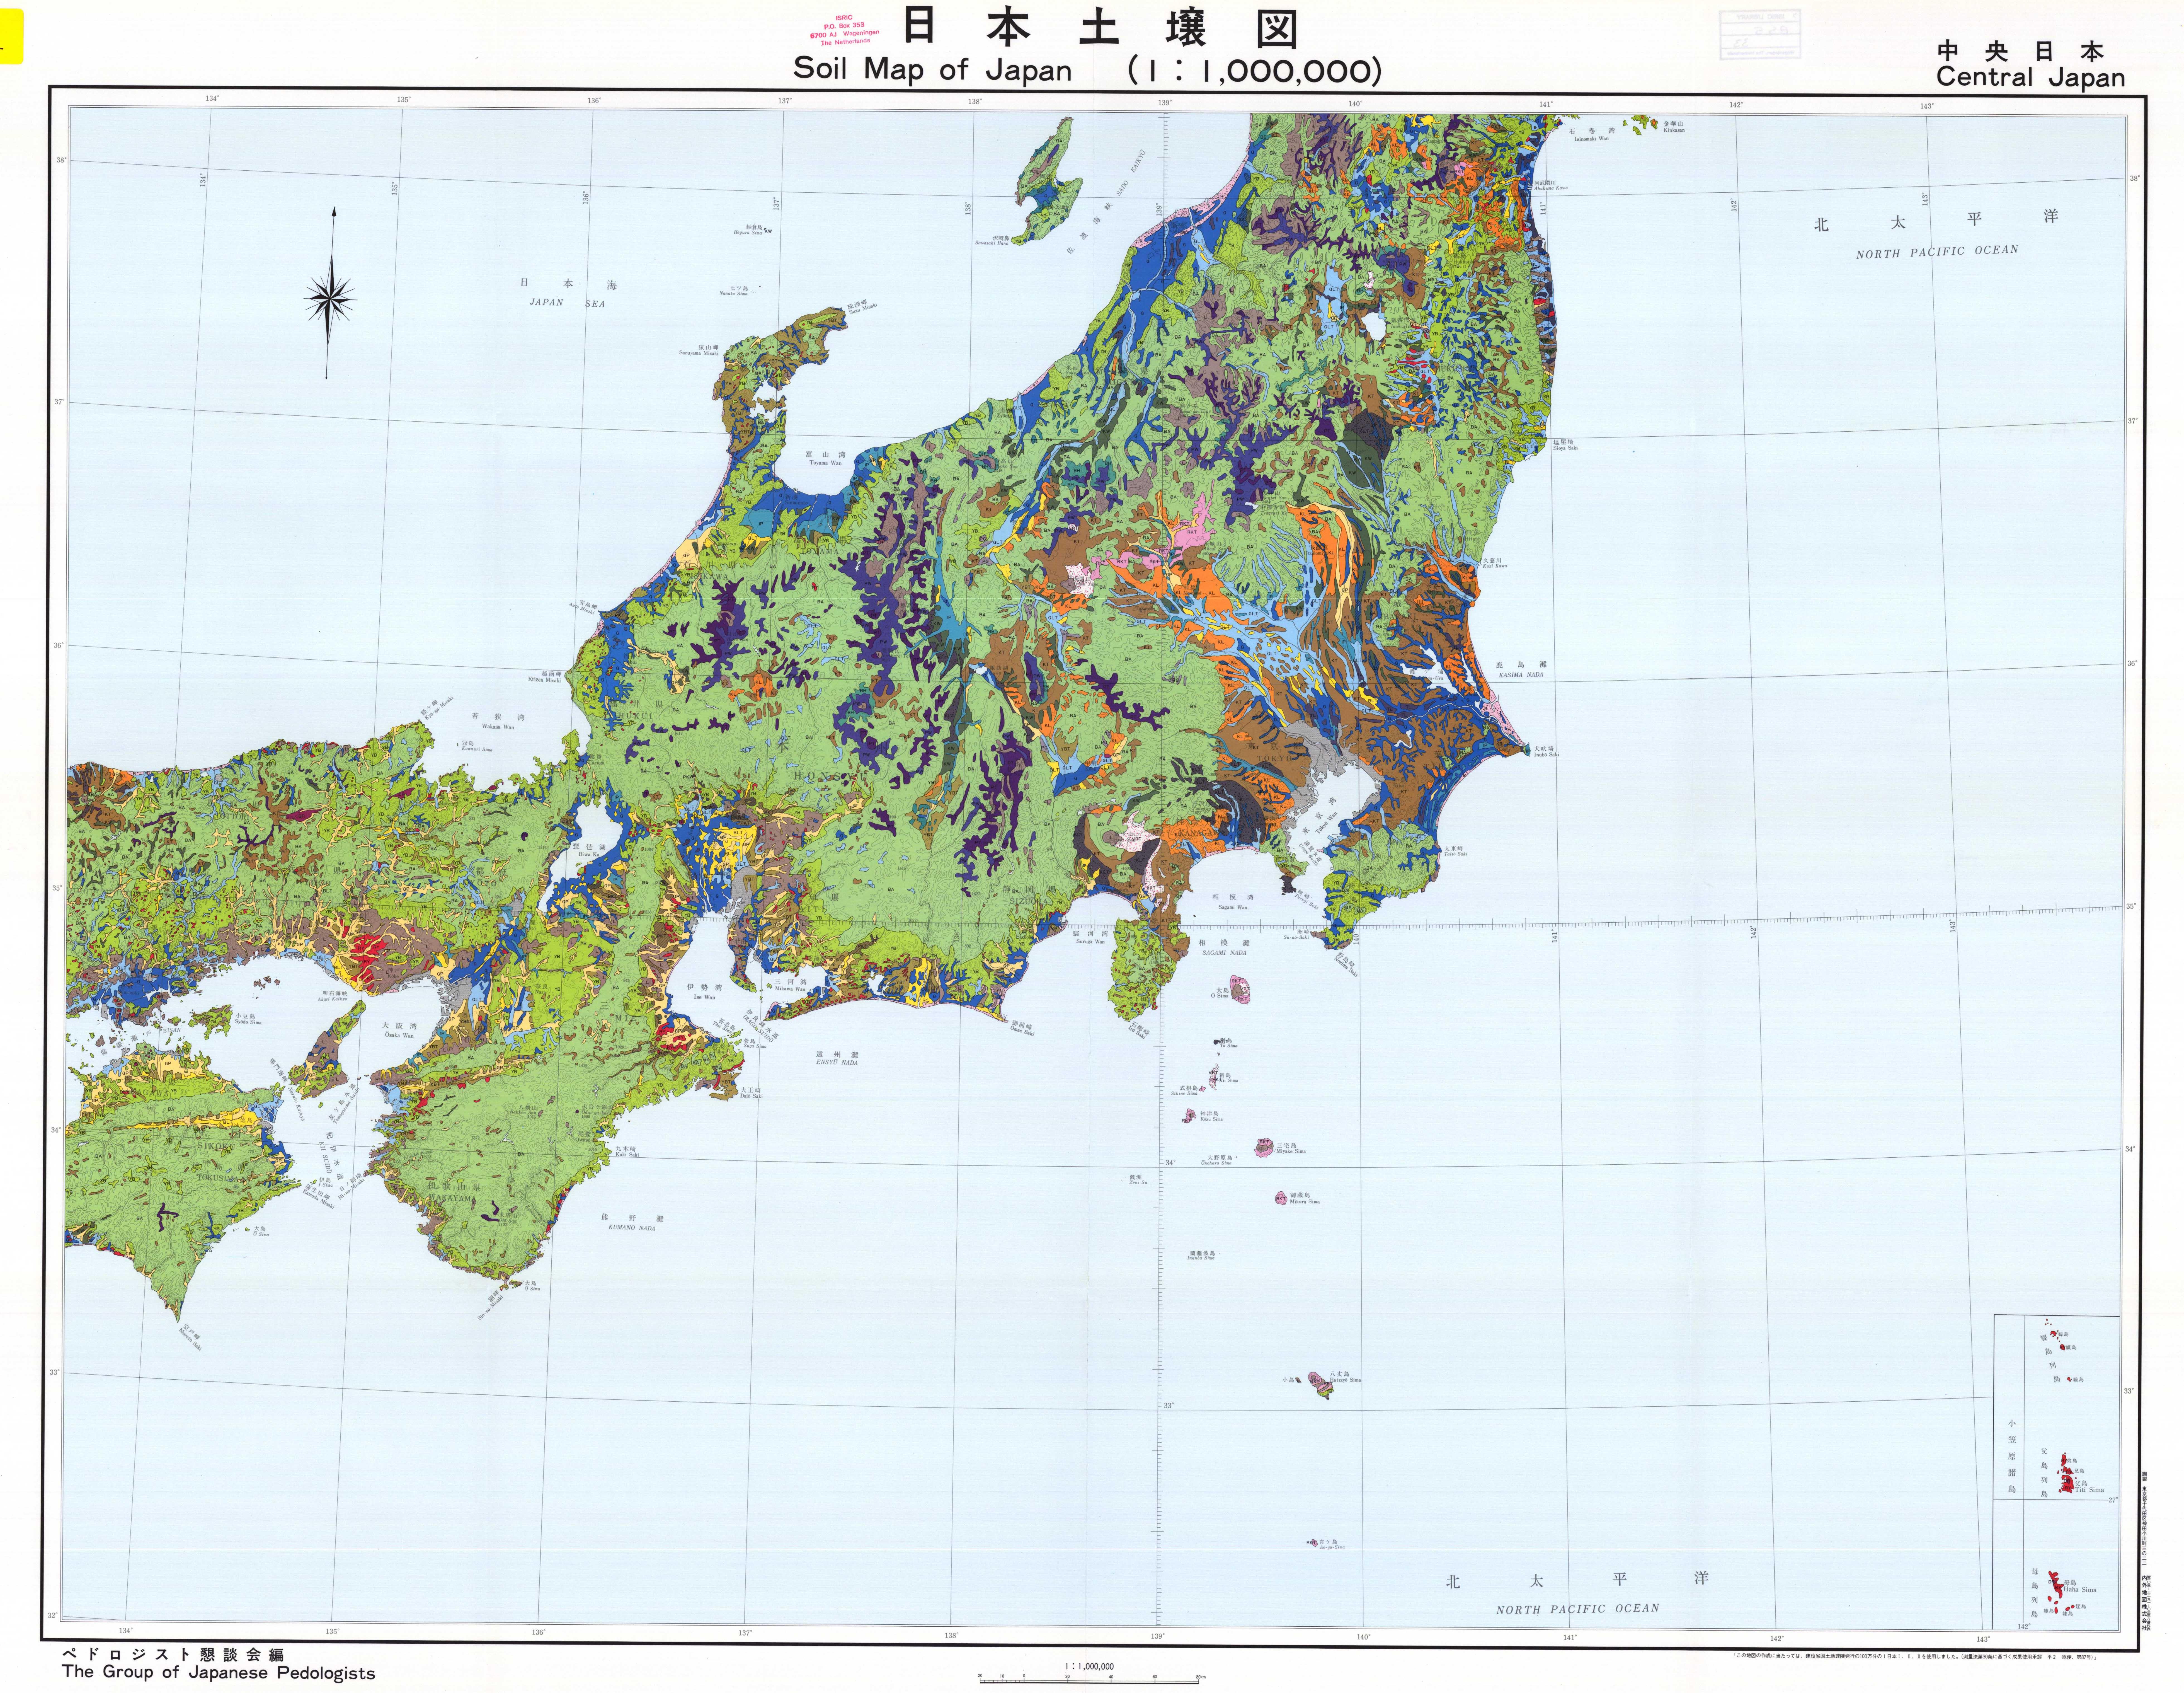 Soil Map Of Japan Central Japan Legend Available In MapRoom - Japan map legend